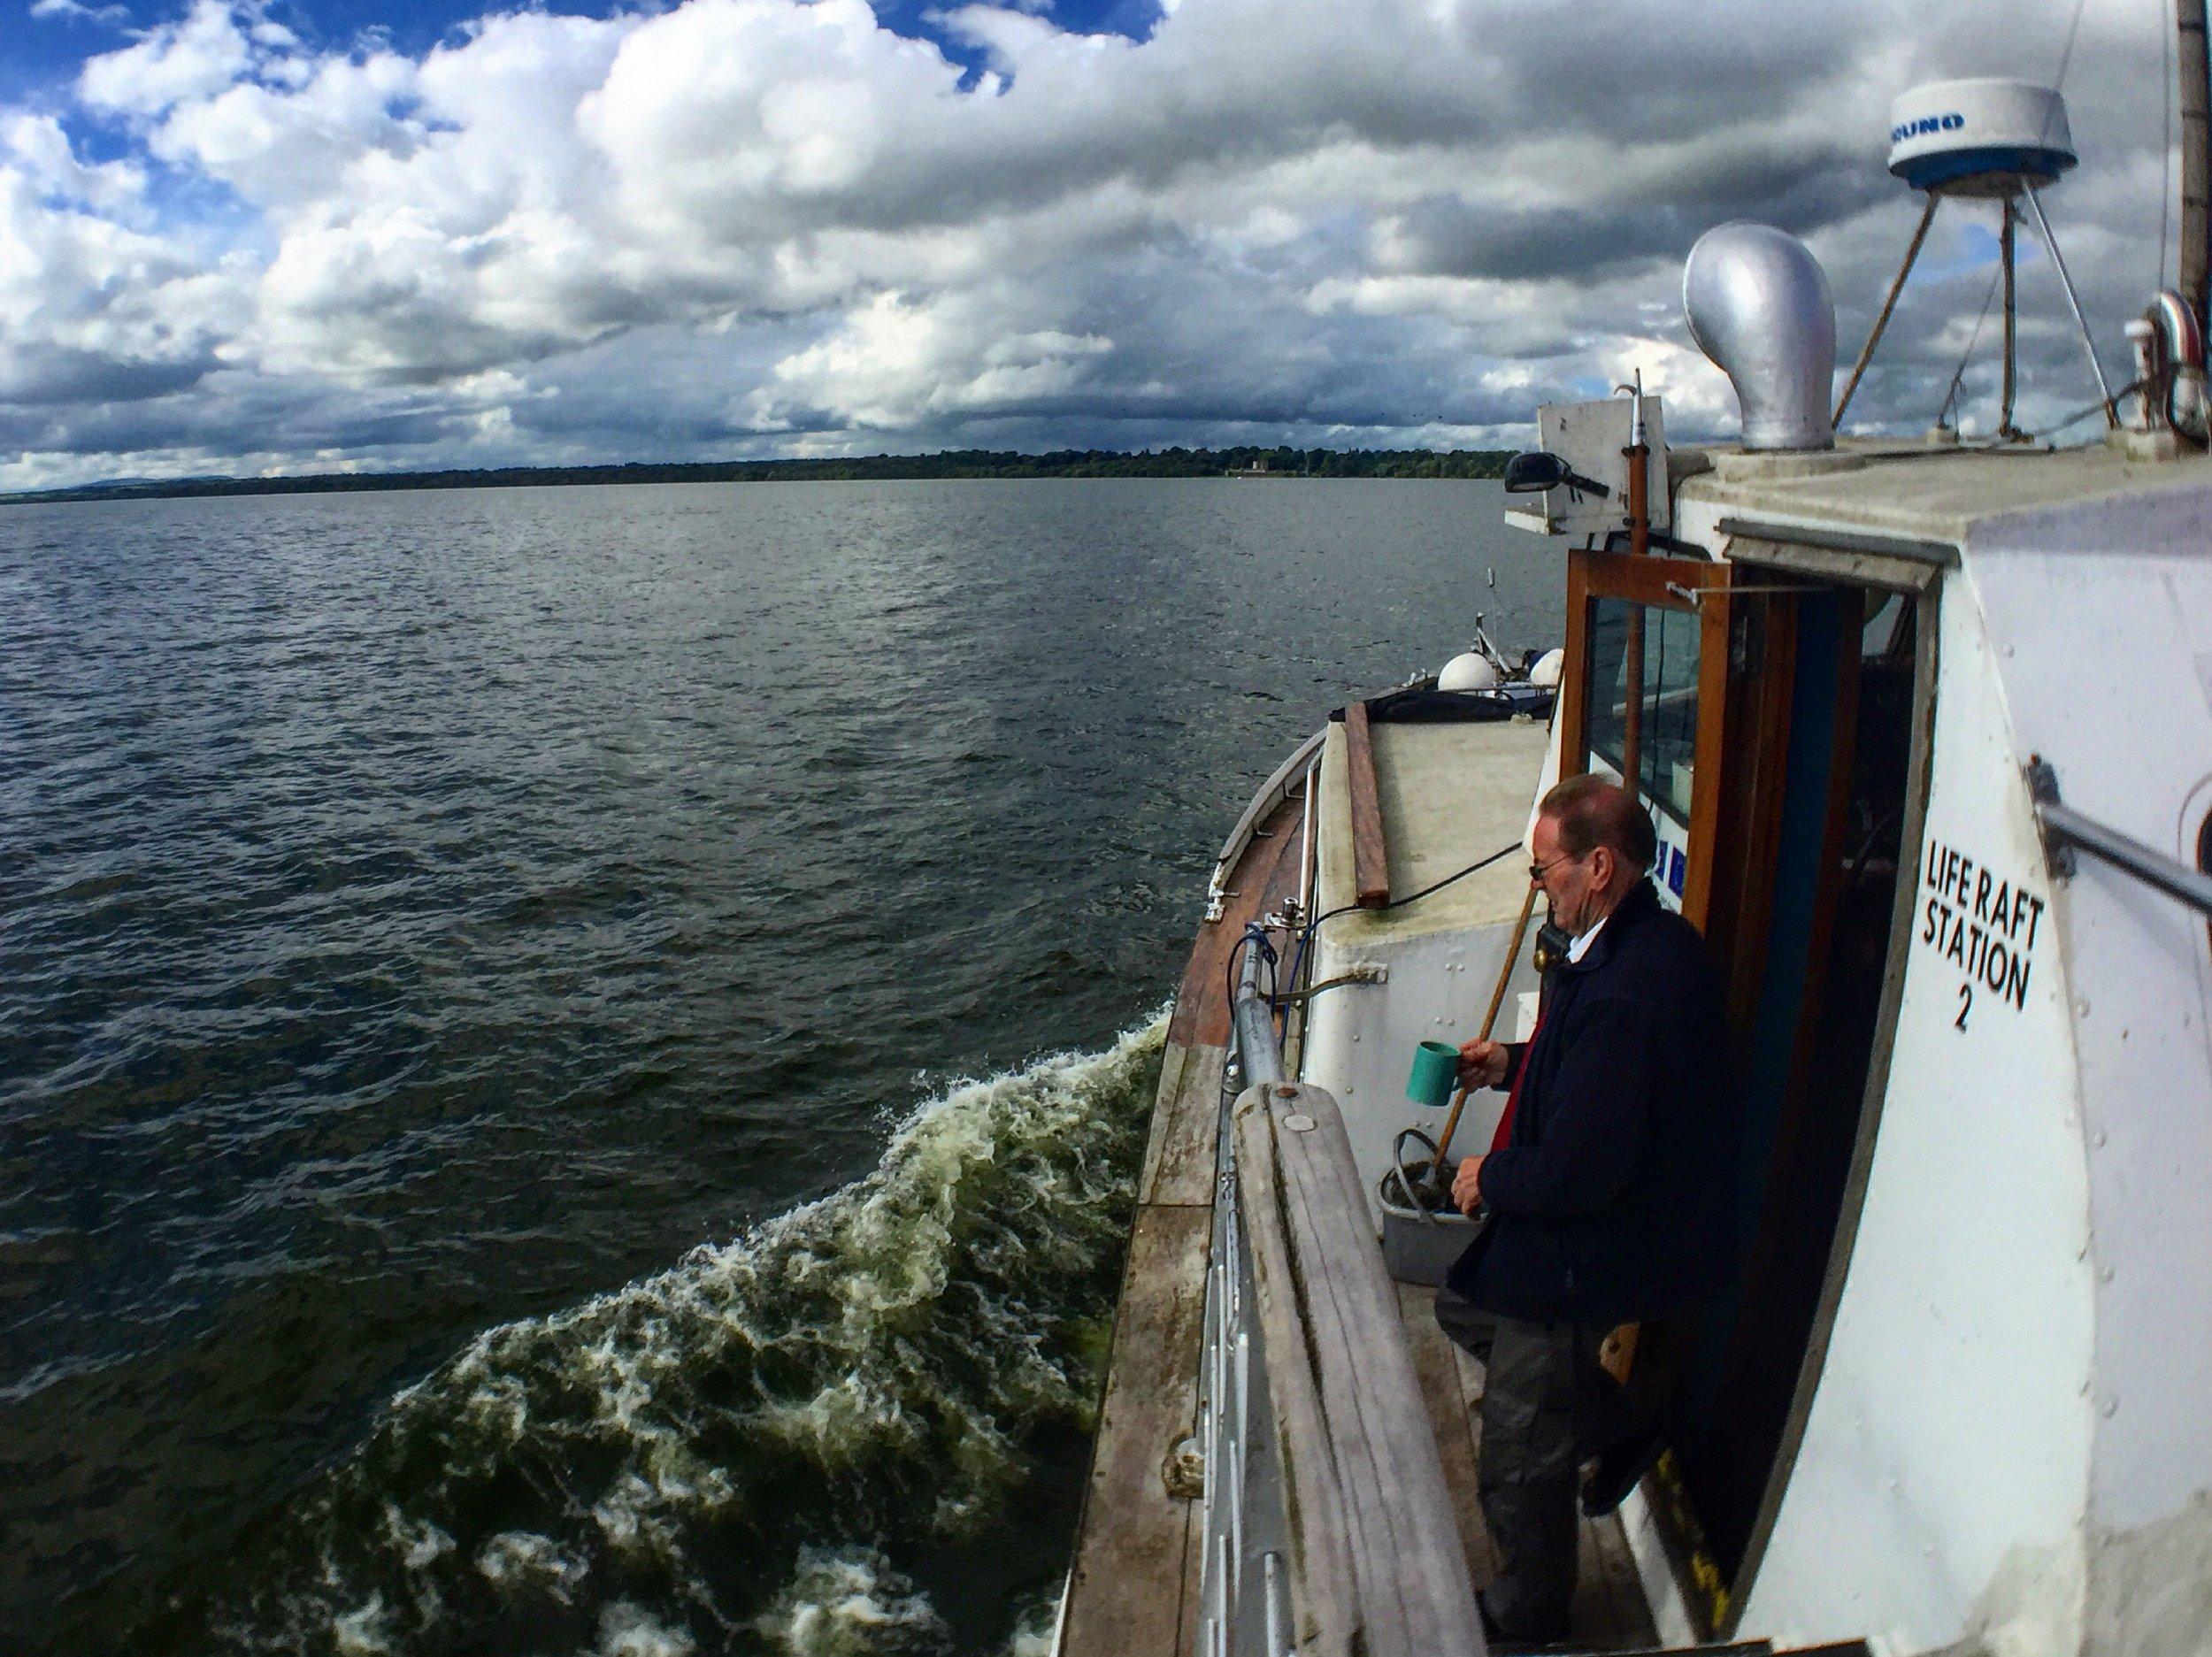 captain_boat_maid_of_antrim_lough_neagh_antrim_northern_ireland_ni_explorer_niexplorer.jpg